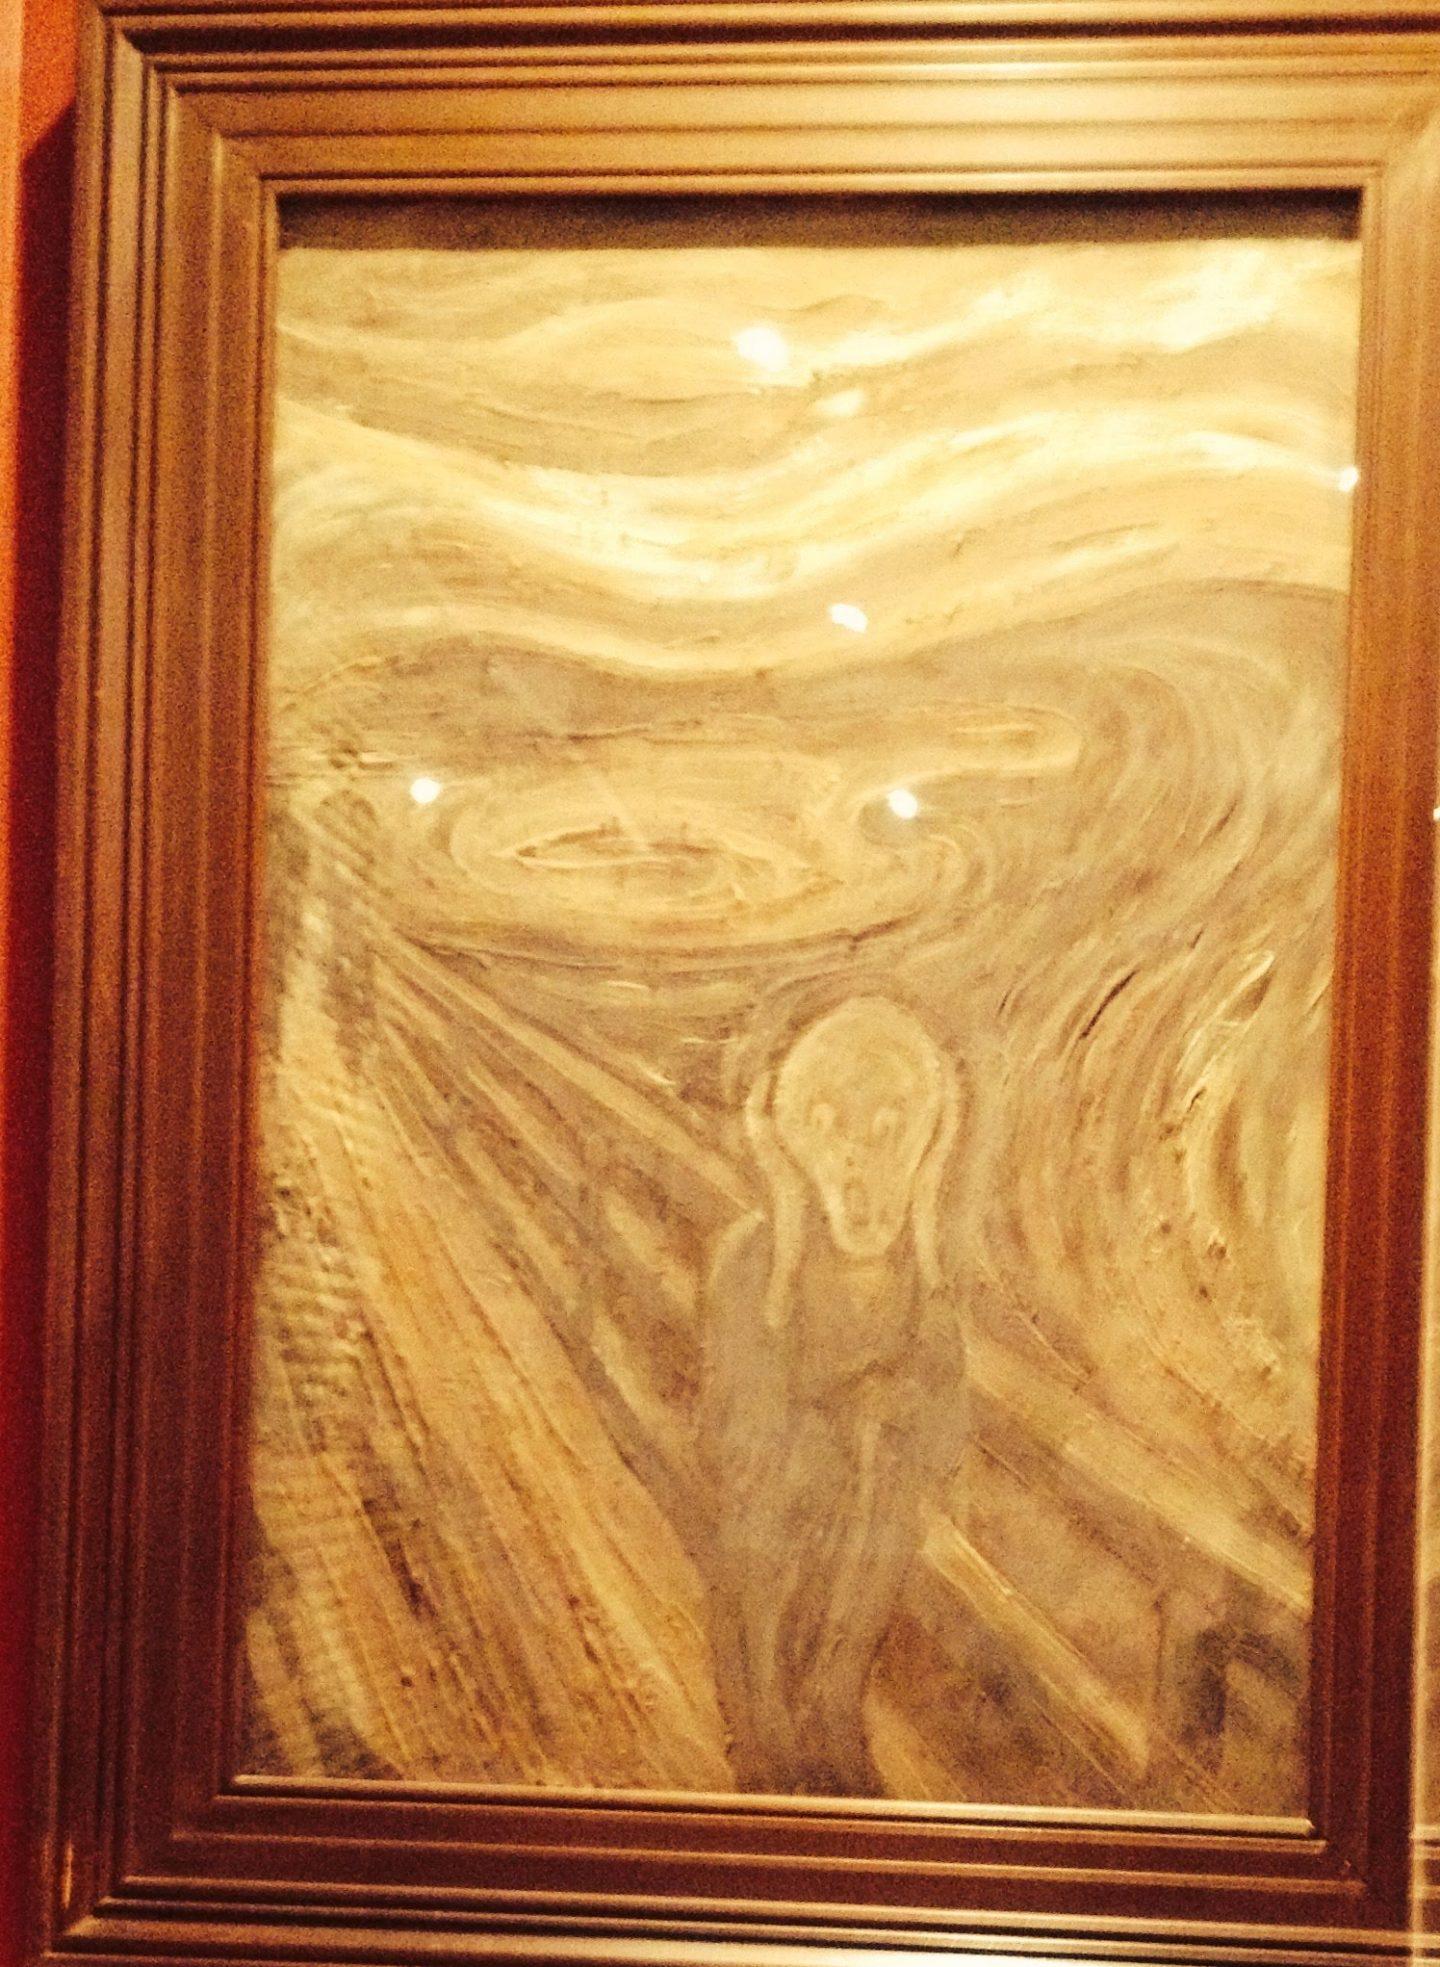 Edvard Munch's Scream made from chocolate